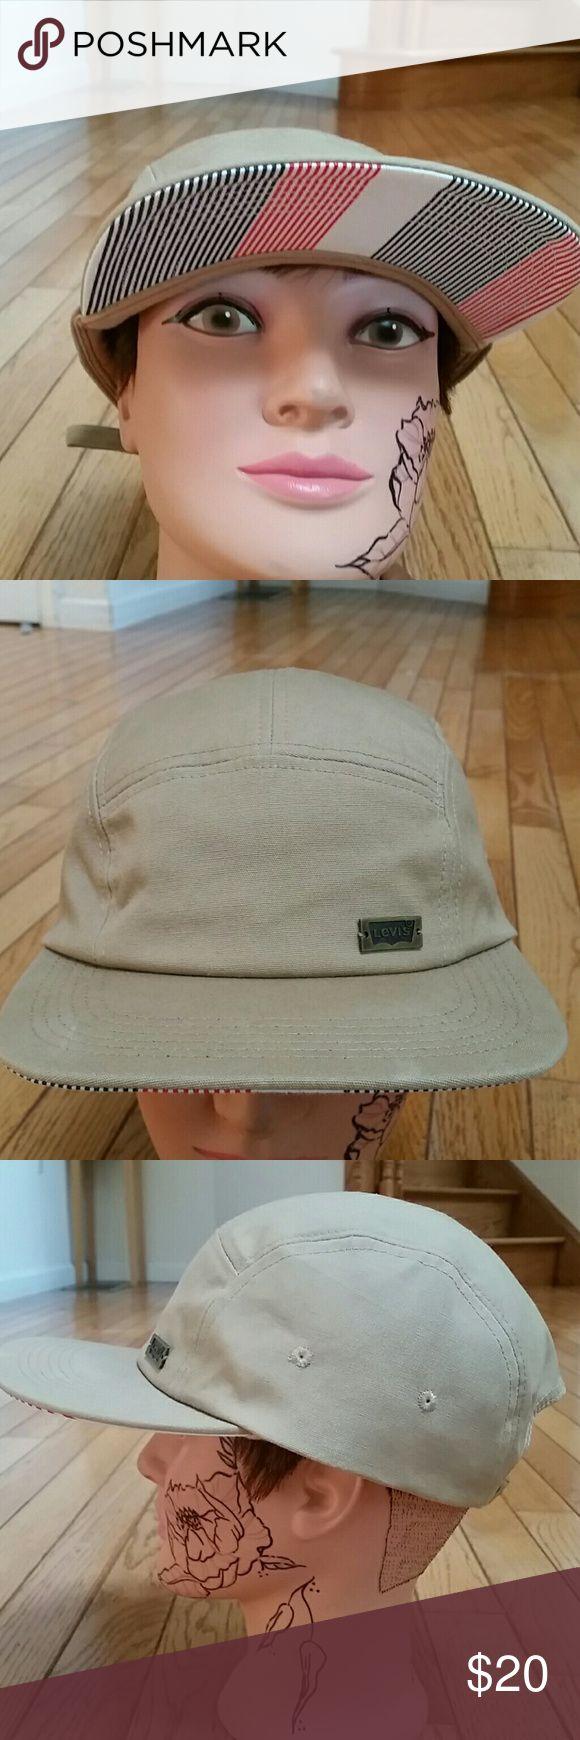 Levi's 5 Panel hat Levi's 5 Panel hat Levi's Accessories Hats